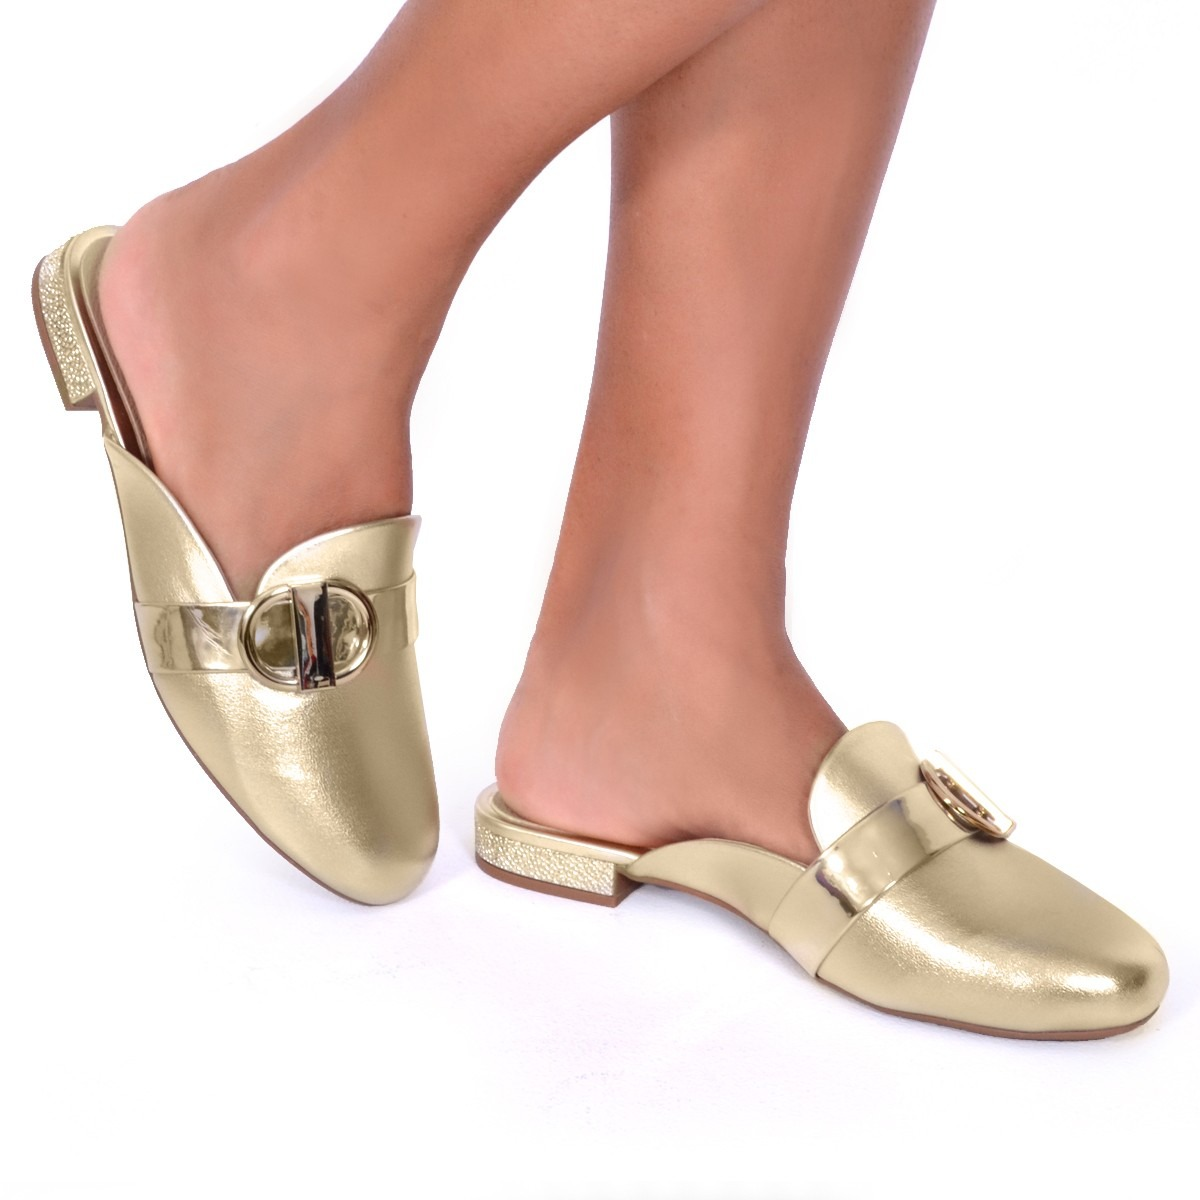 9fac724327 mule modare sapato dourado metalizado conforto ref 7503.101. Carregando zoom.  Mocassim Feminino Mule Metalizado Vizzano 1248109